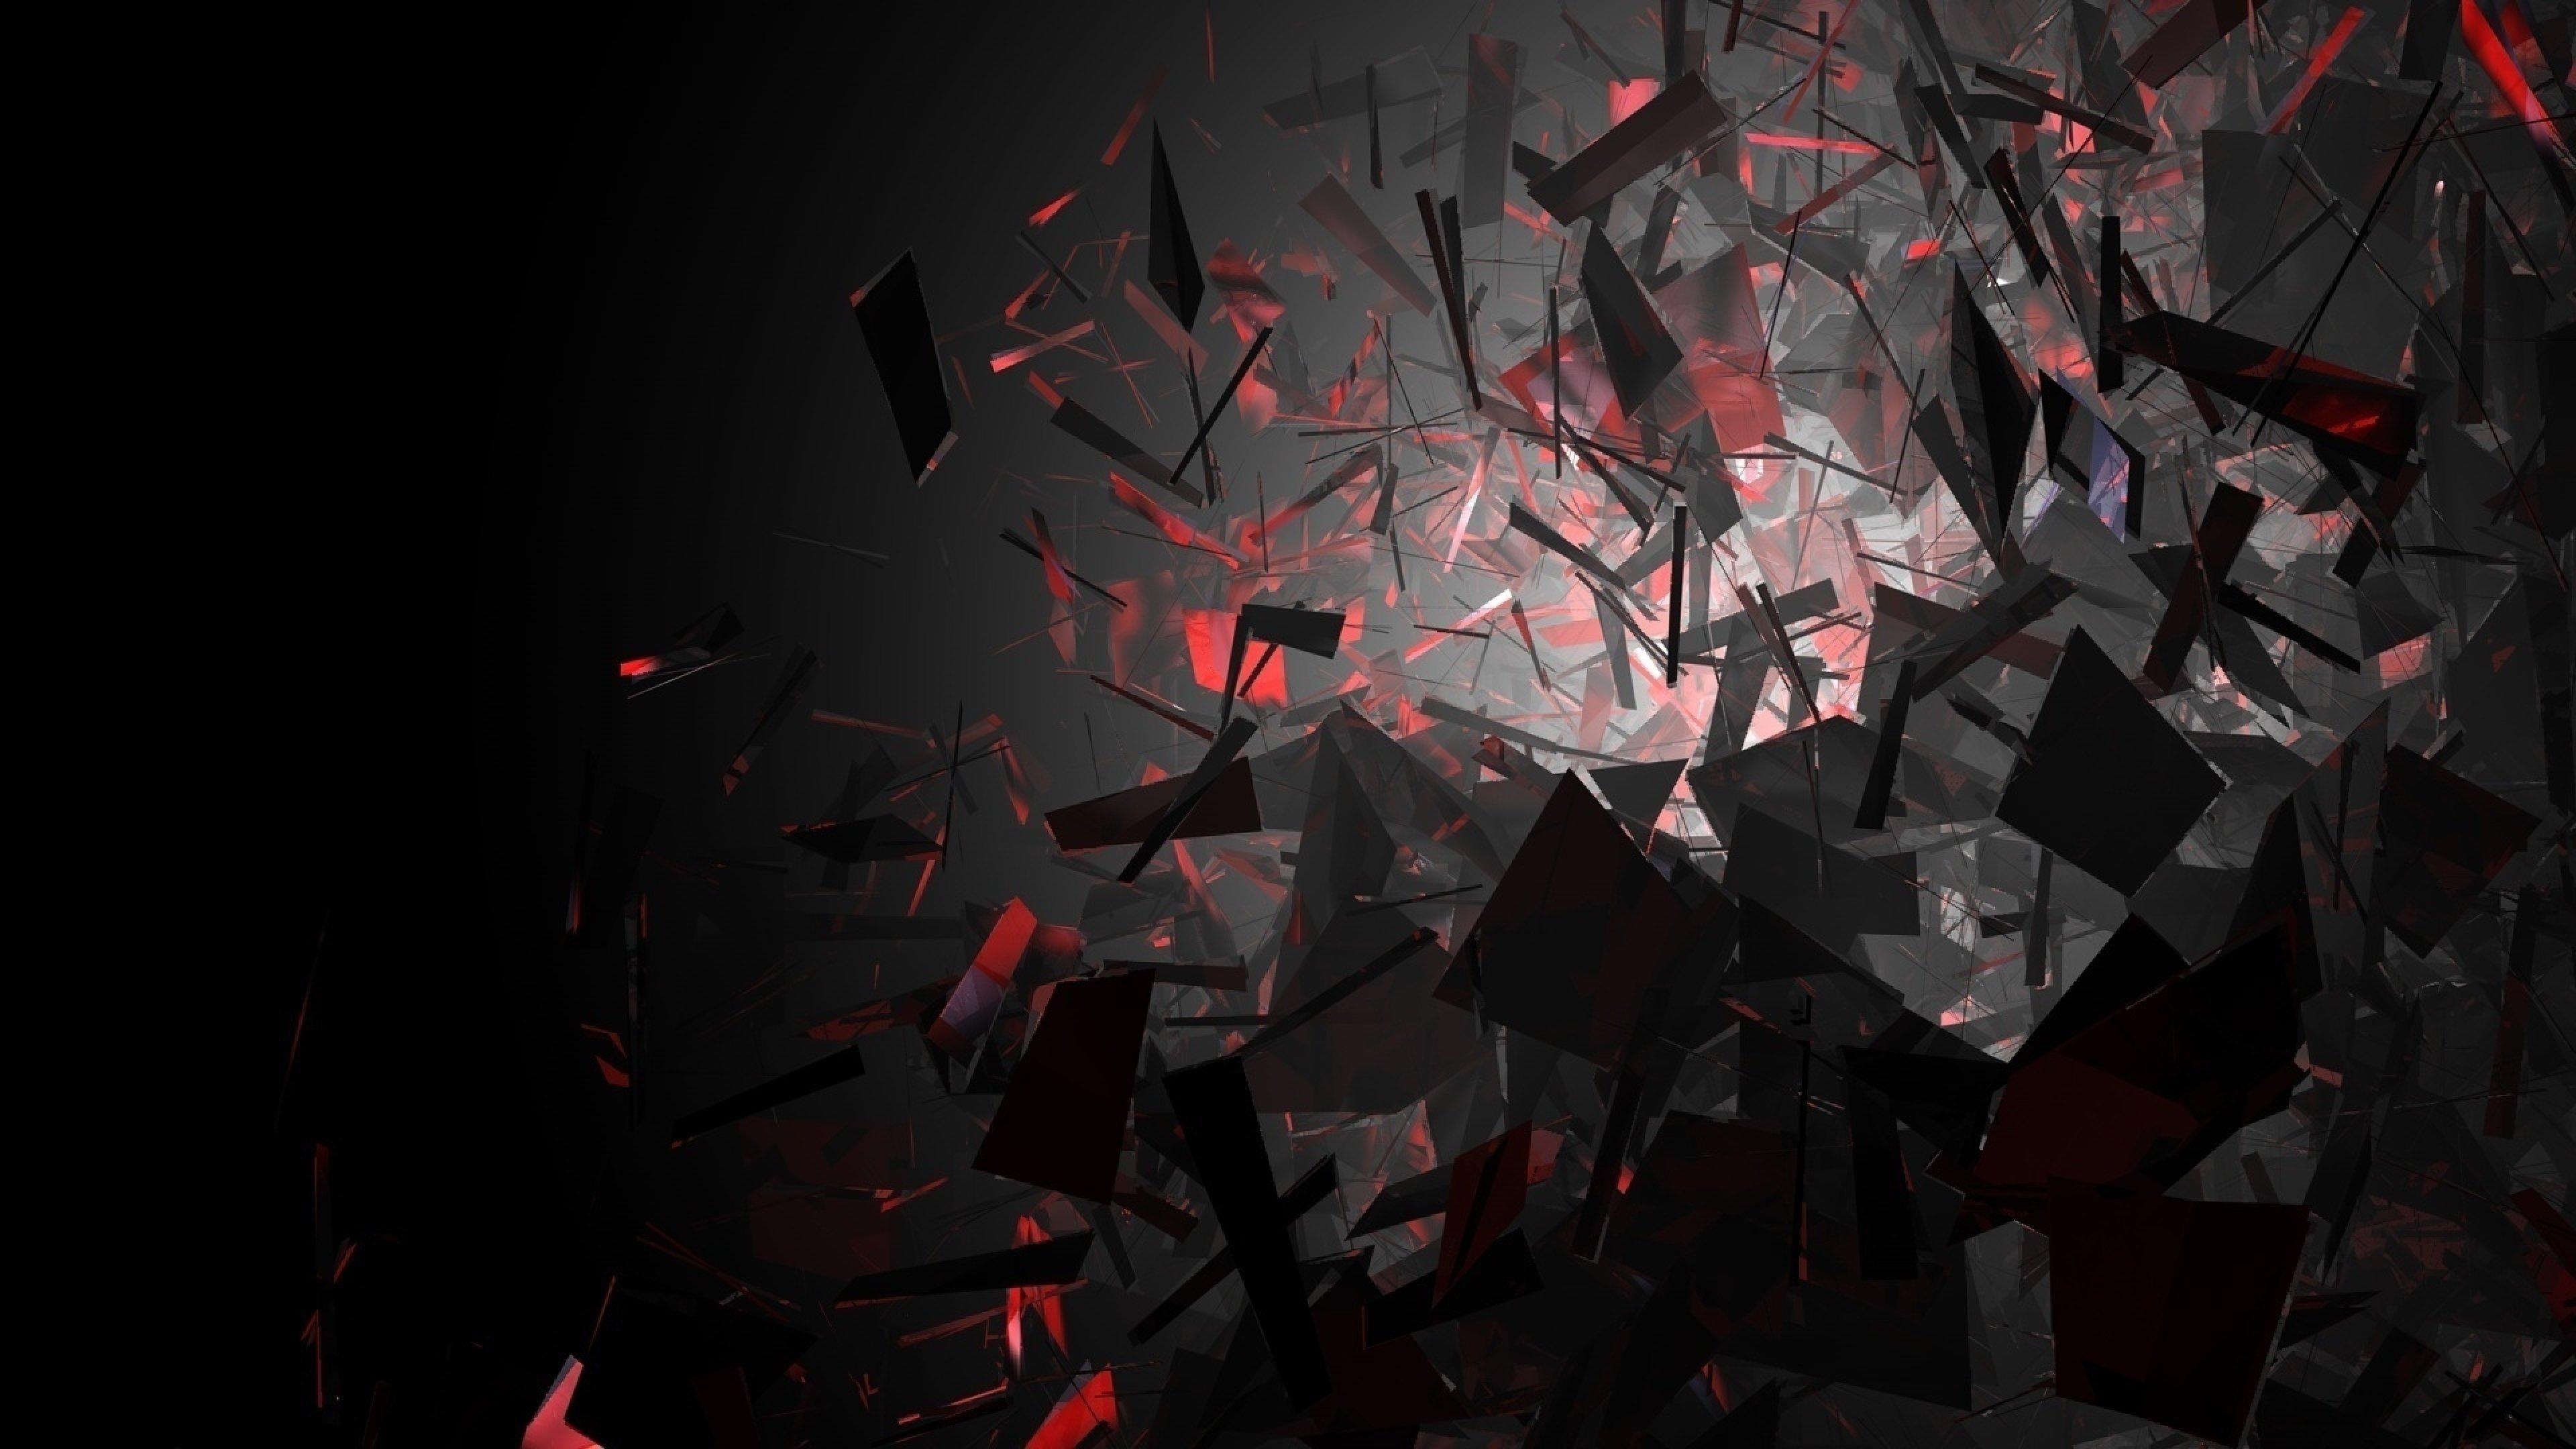 Broken Screen 4k Wallpaper HD